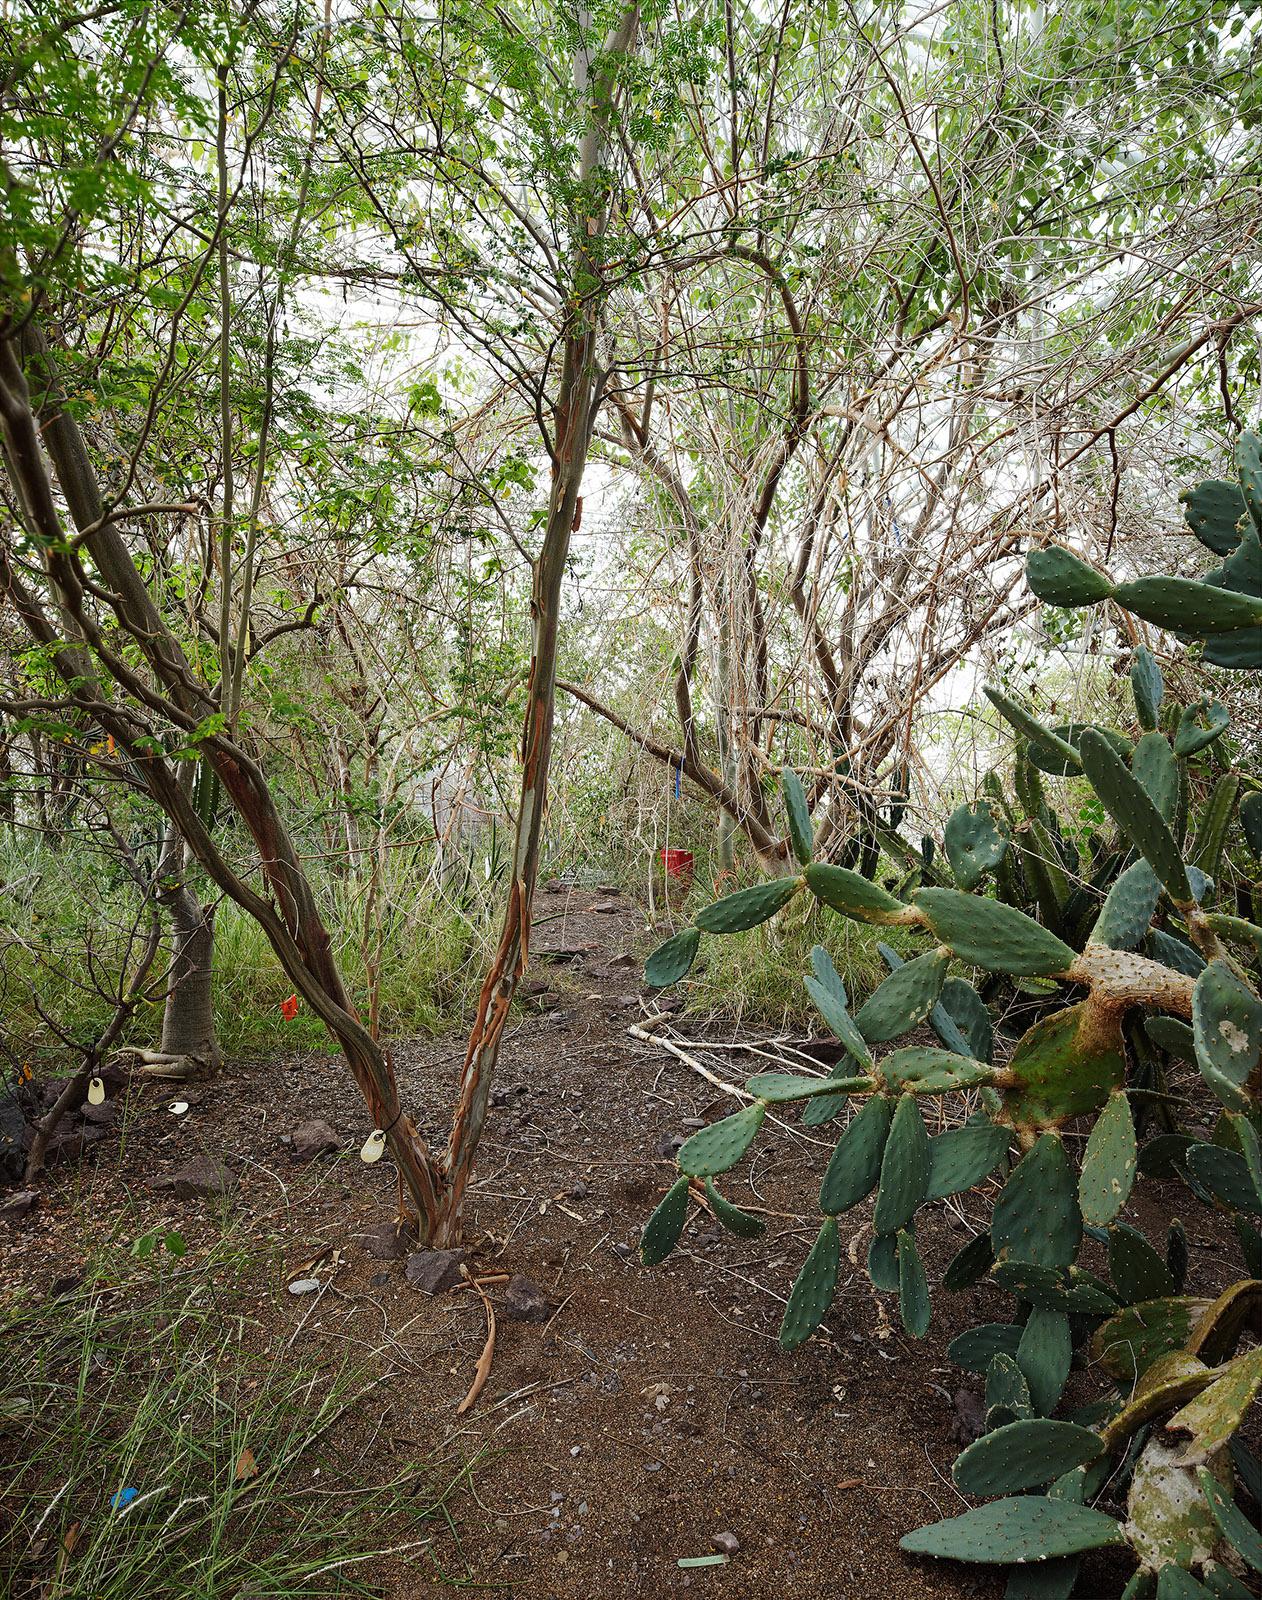 08_949e142d2d232351-cactus_2.jpg